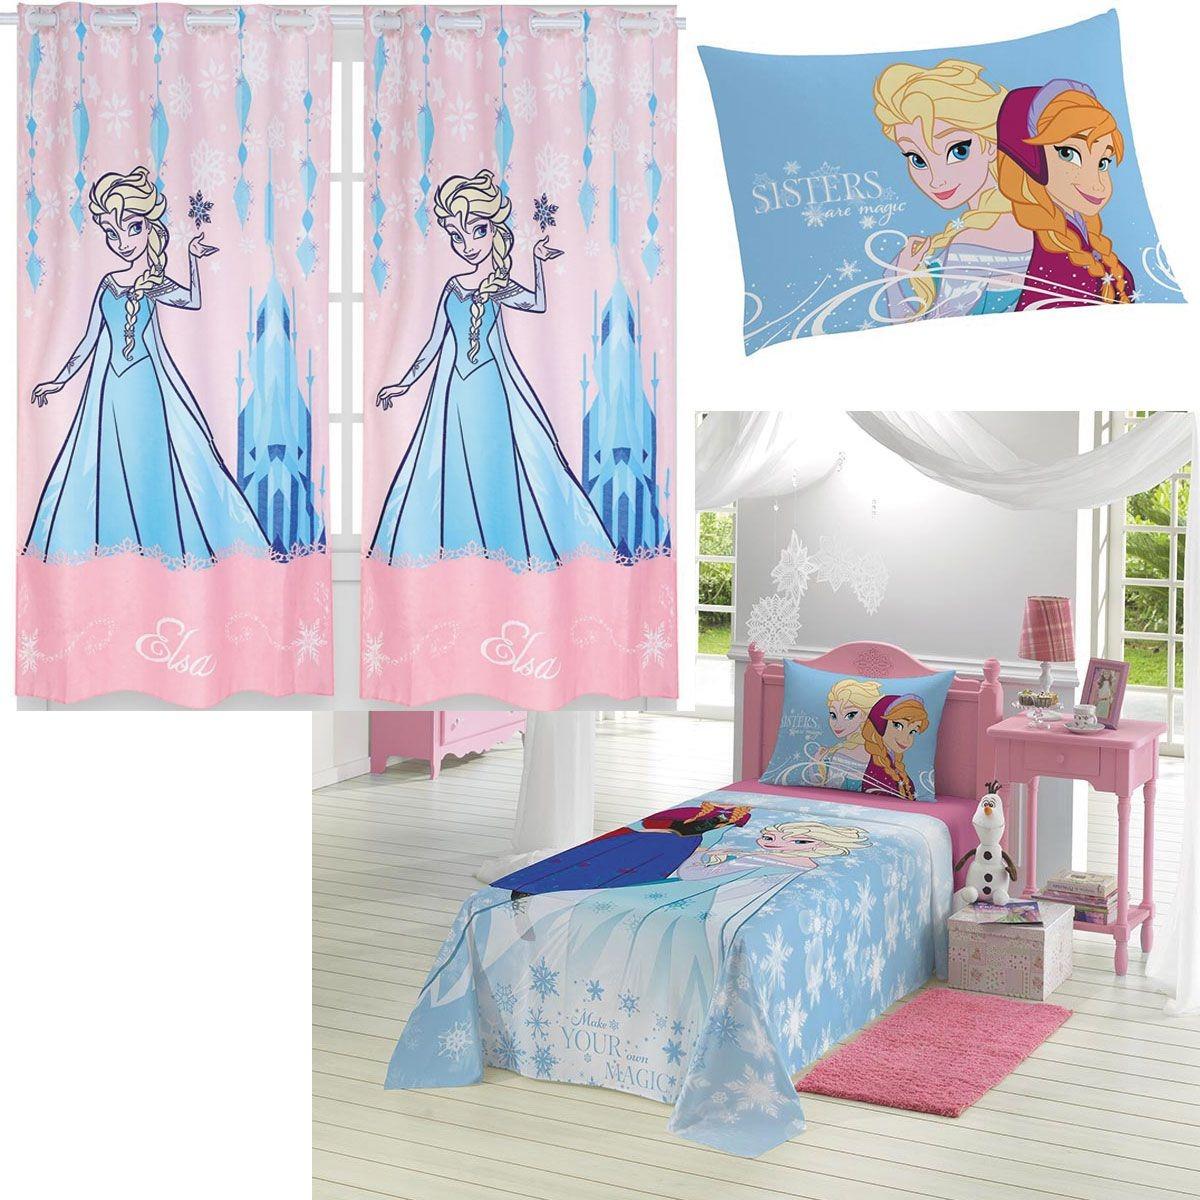 847c8db14 Kit Da Frozen Jogo De Lençol + Cortina Infantil Disney - R$ 184,95 ...